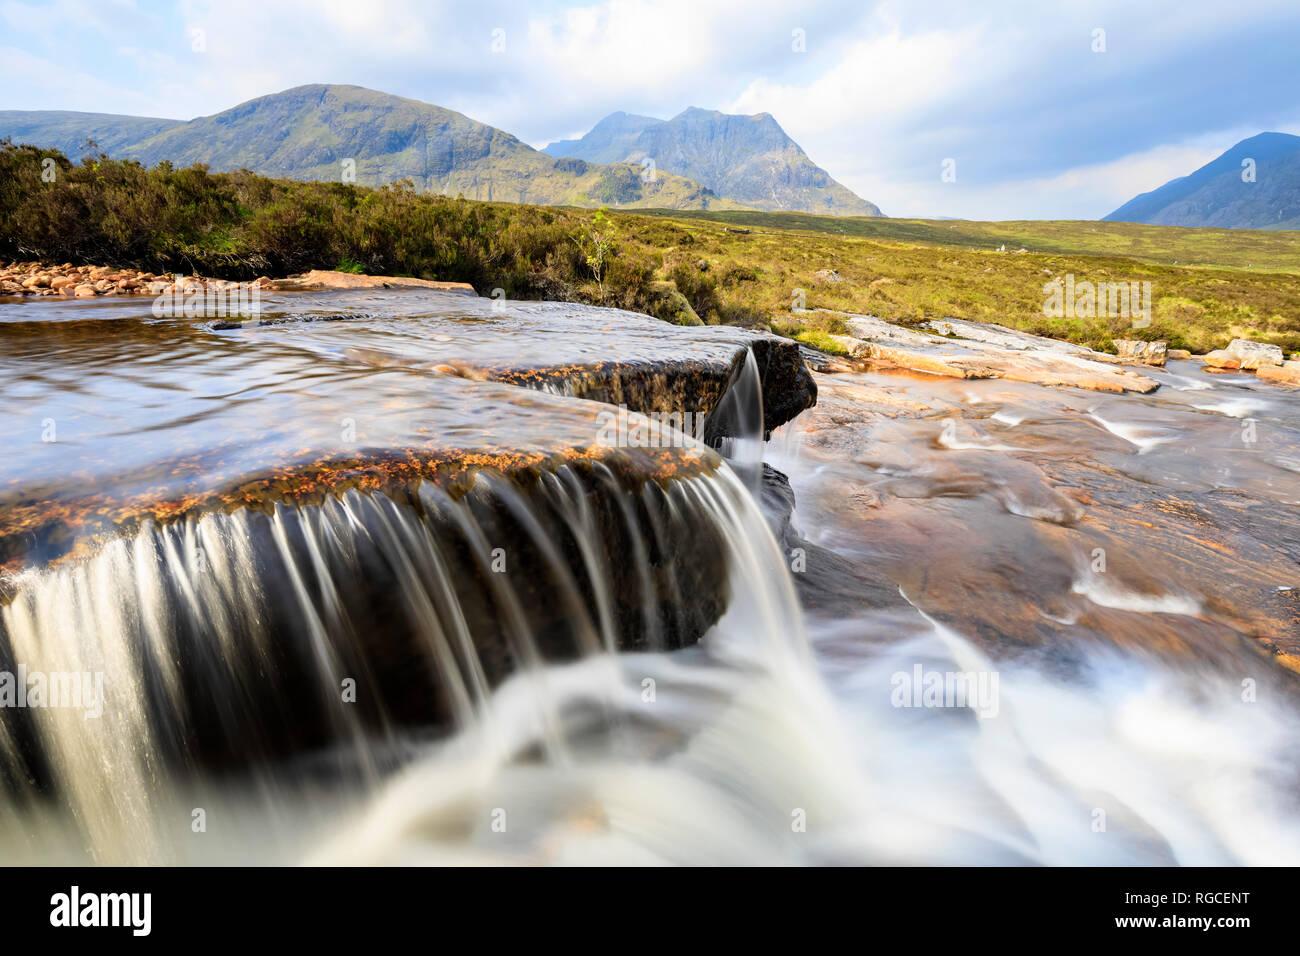 Great Britain, Scotland, Scottish Highlands, Rannoch Moor, Glencoe, Cauldon Waterfall Moutains Creise and Meall a'Bhuiridh - Stock Image